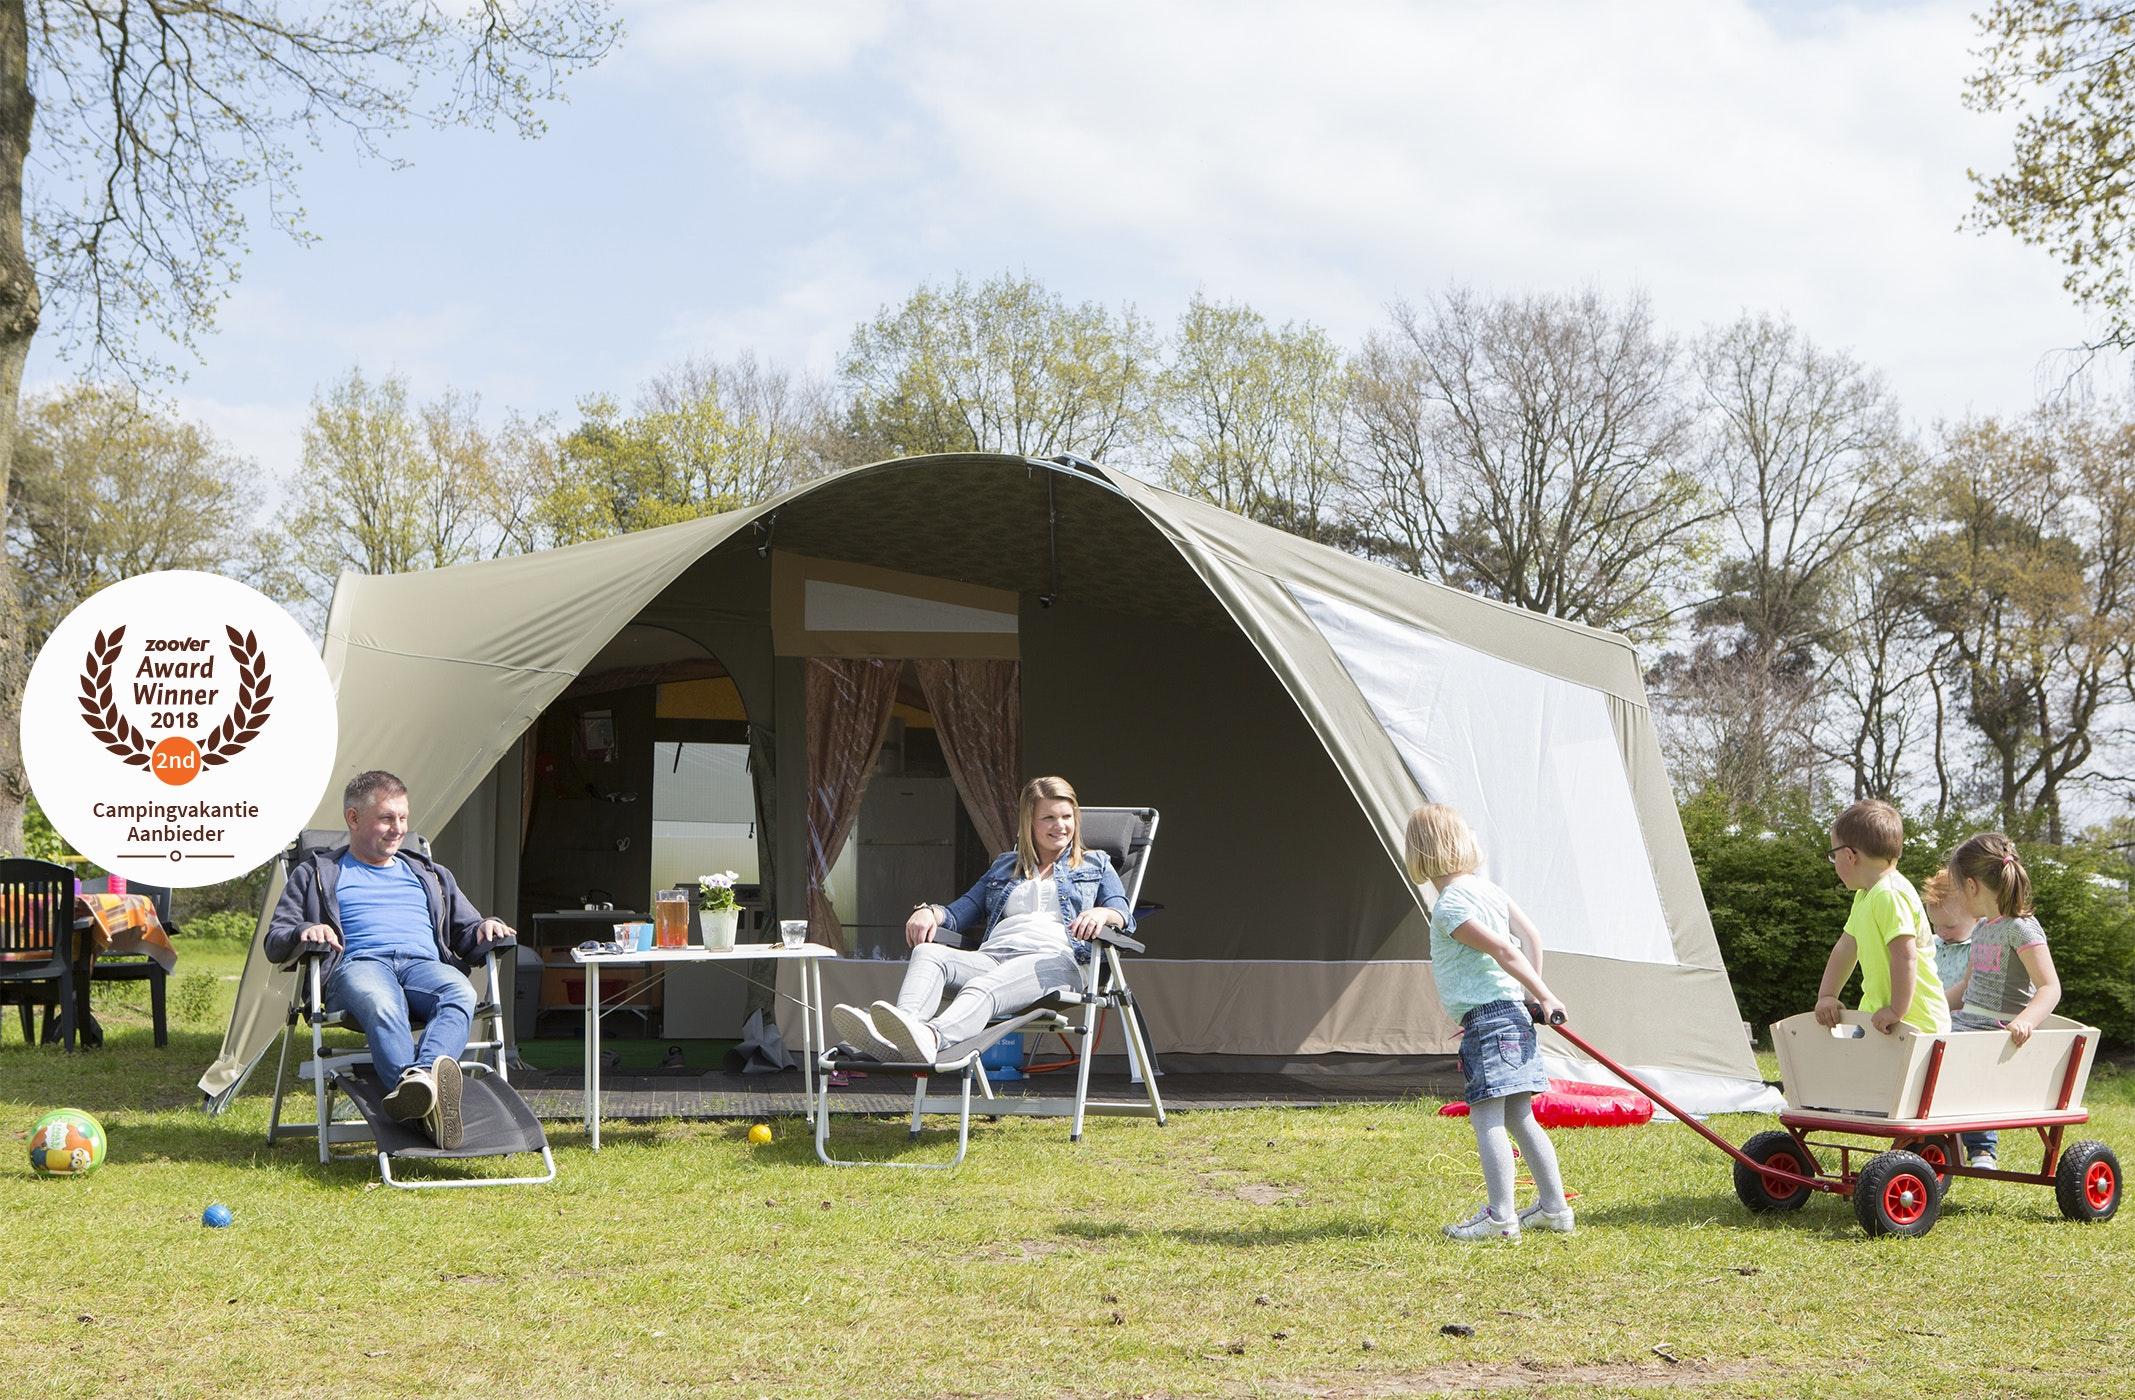 GlamLodge tent Rent-a-Tent